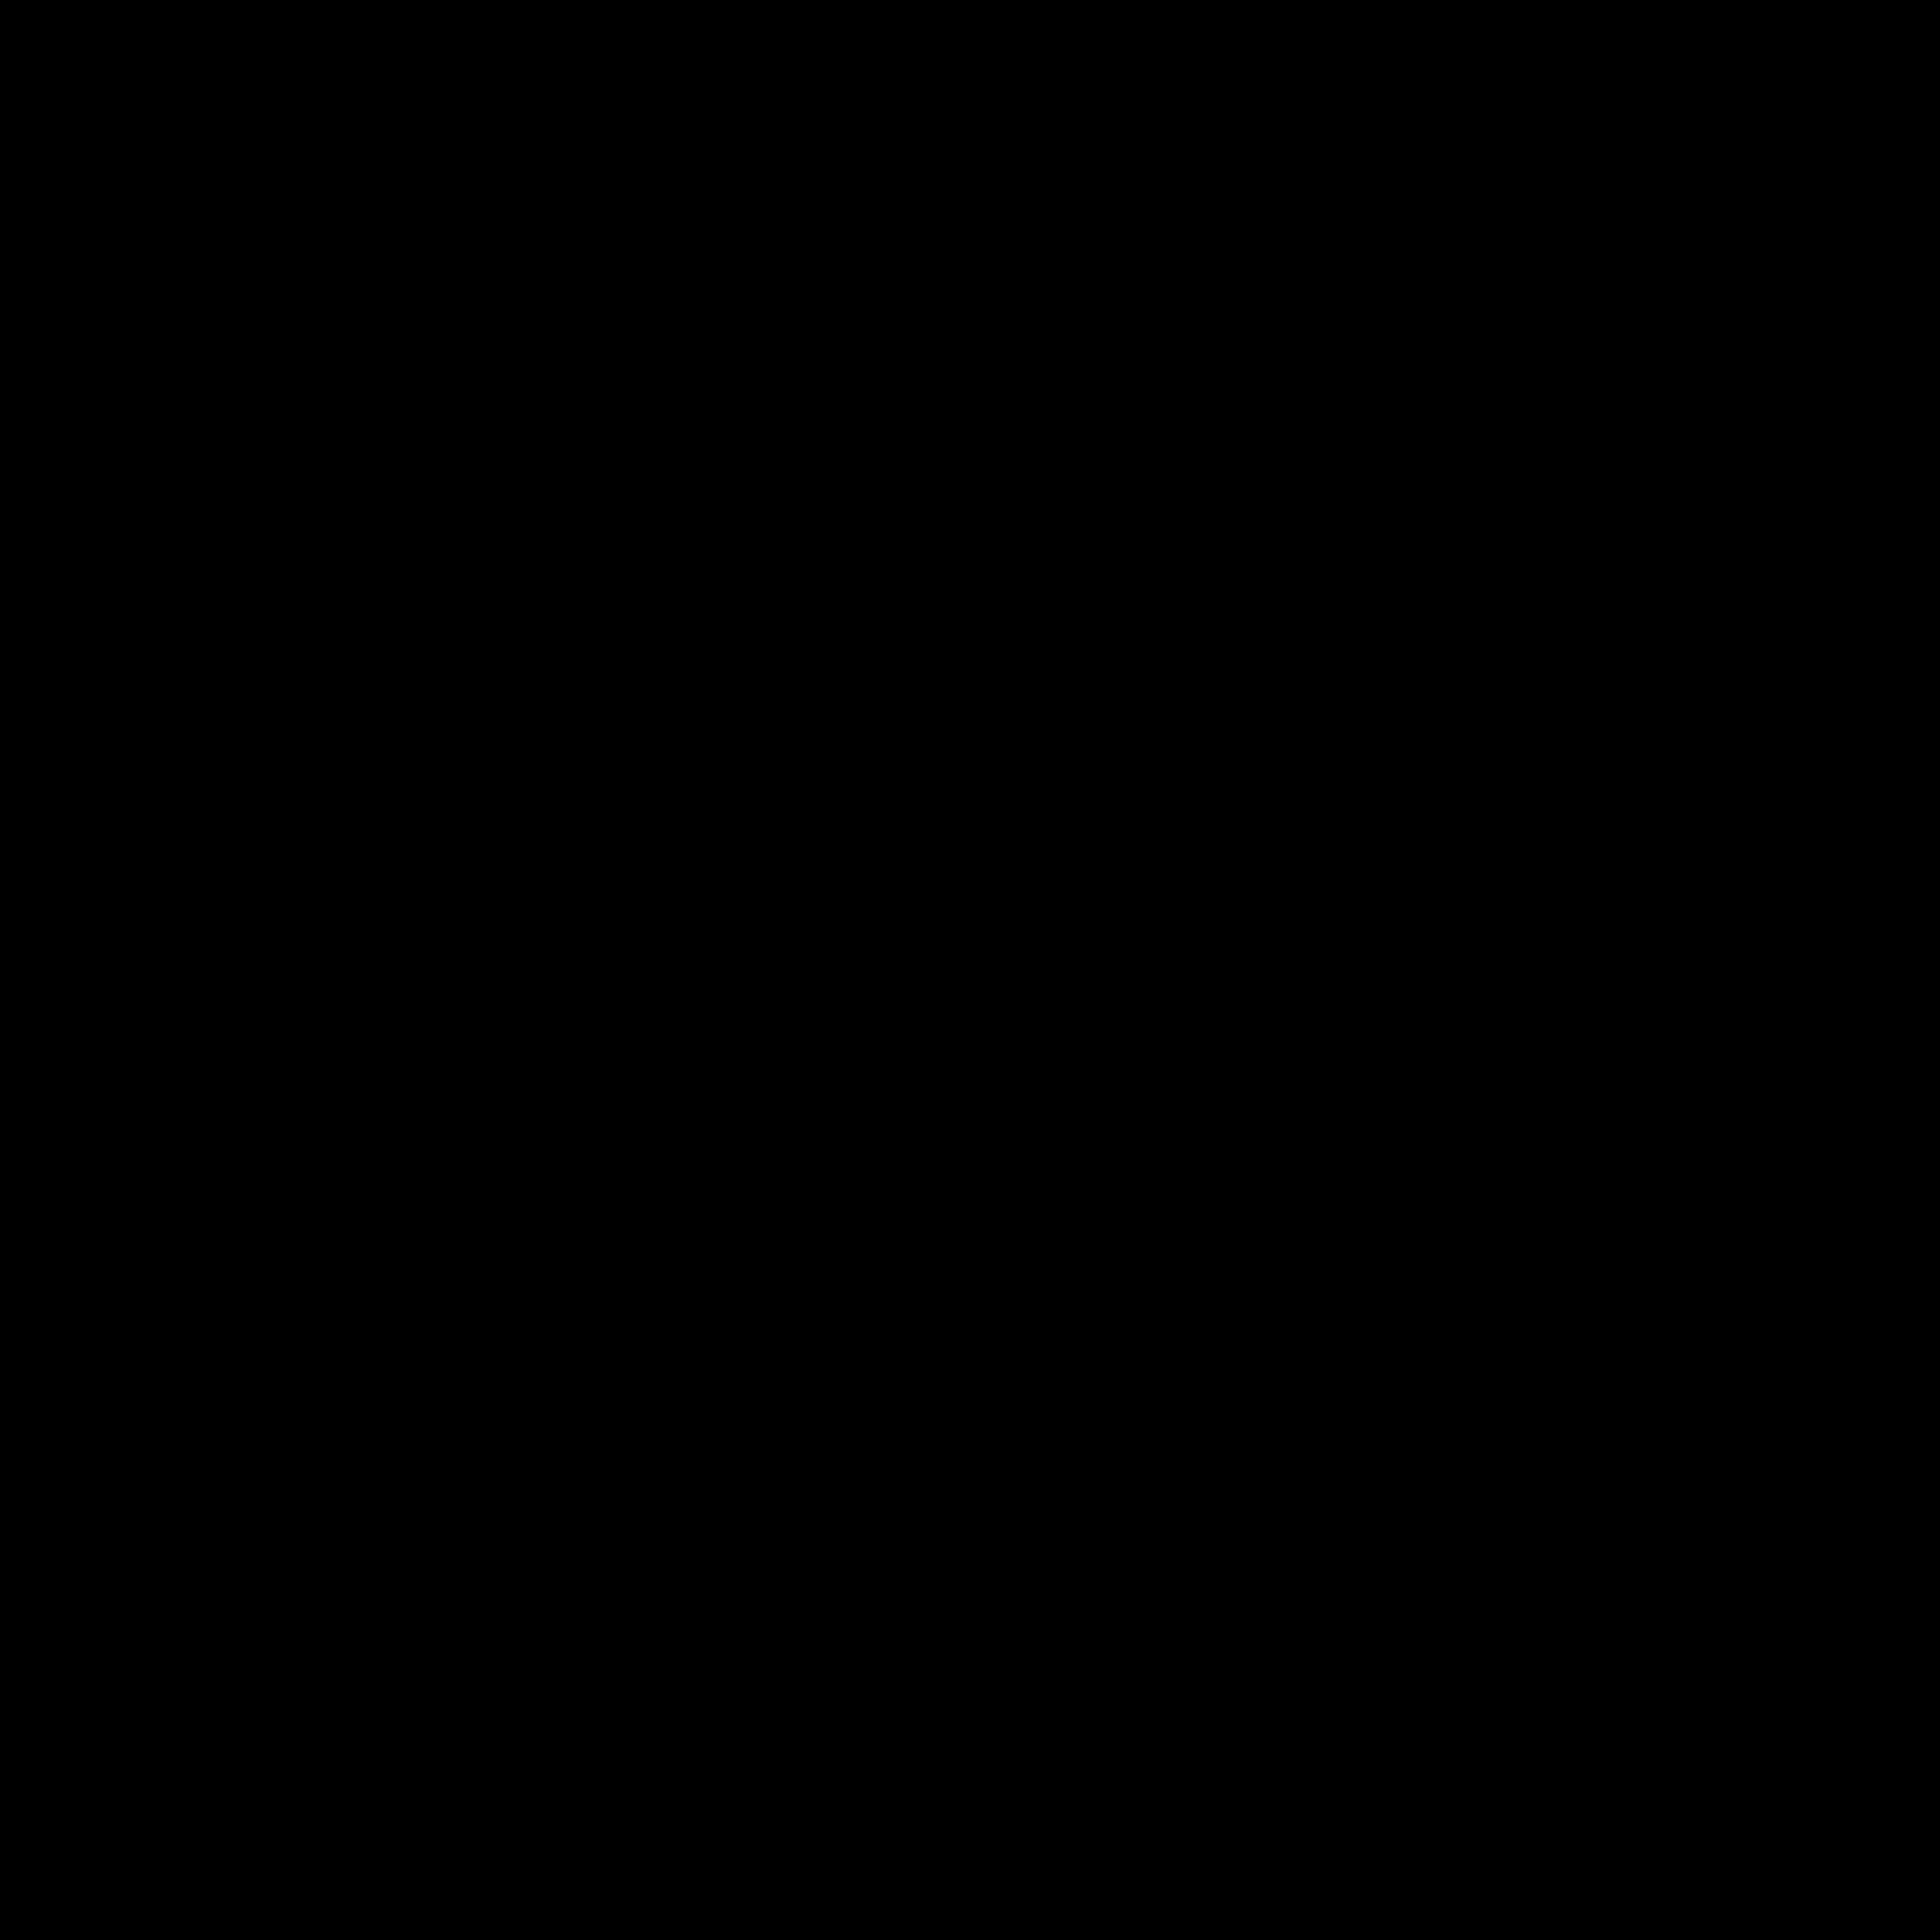 2000x2000 Fileclimber Silhouette.svg